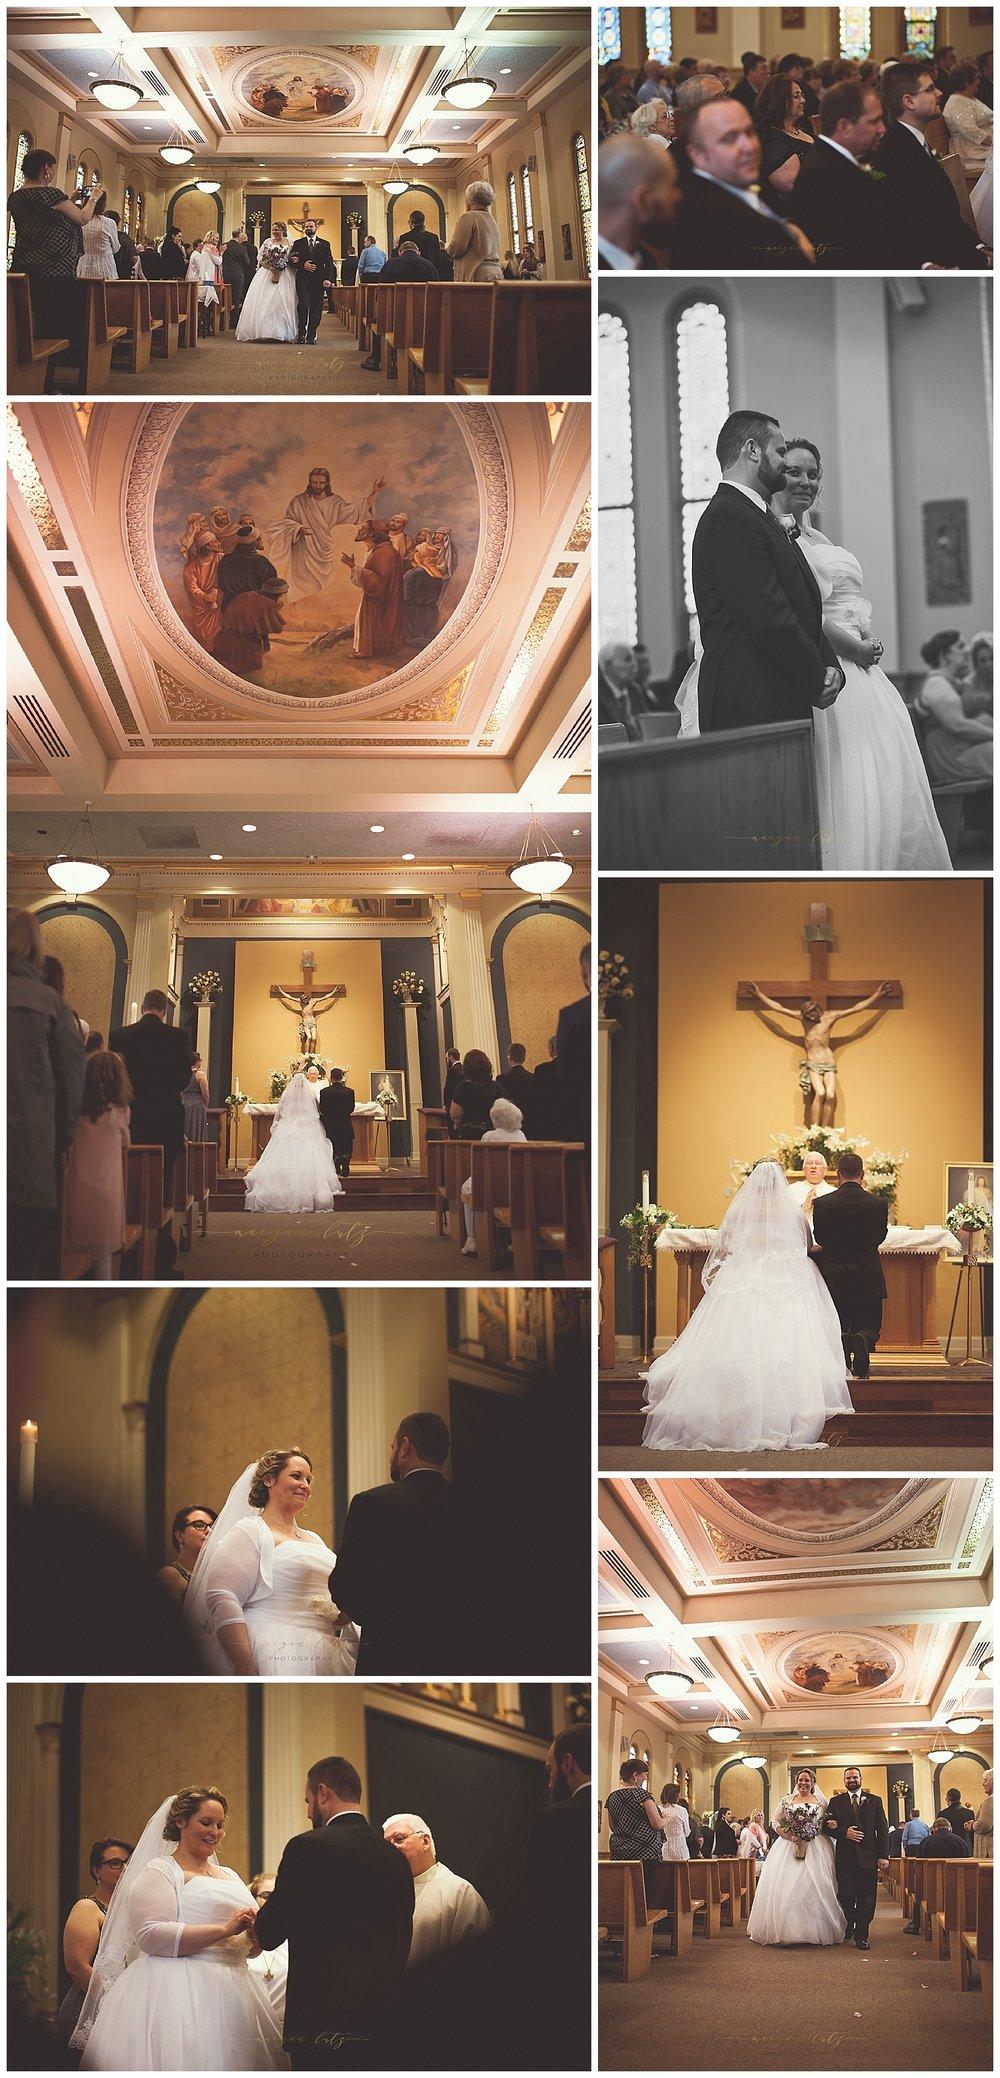 Catholic-Church-Wedding-by-Wedding-Photographer-in-Scranton-NEPA_0030.jpg